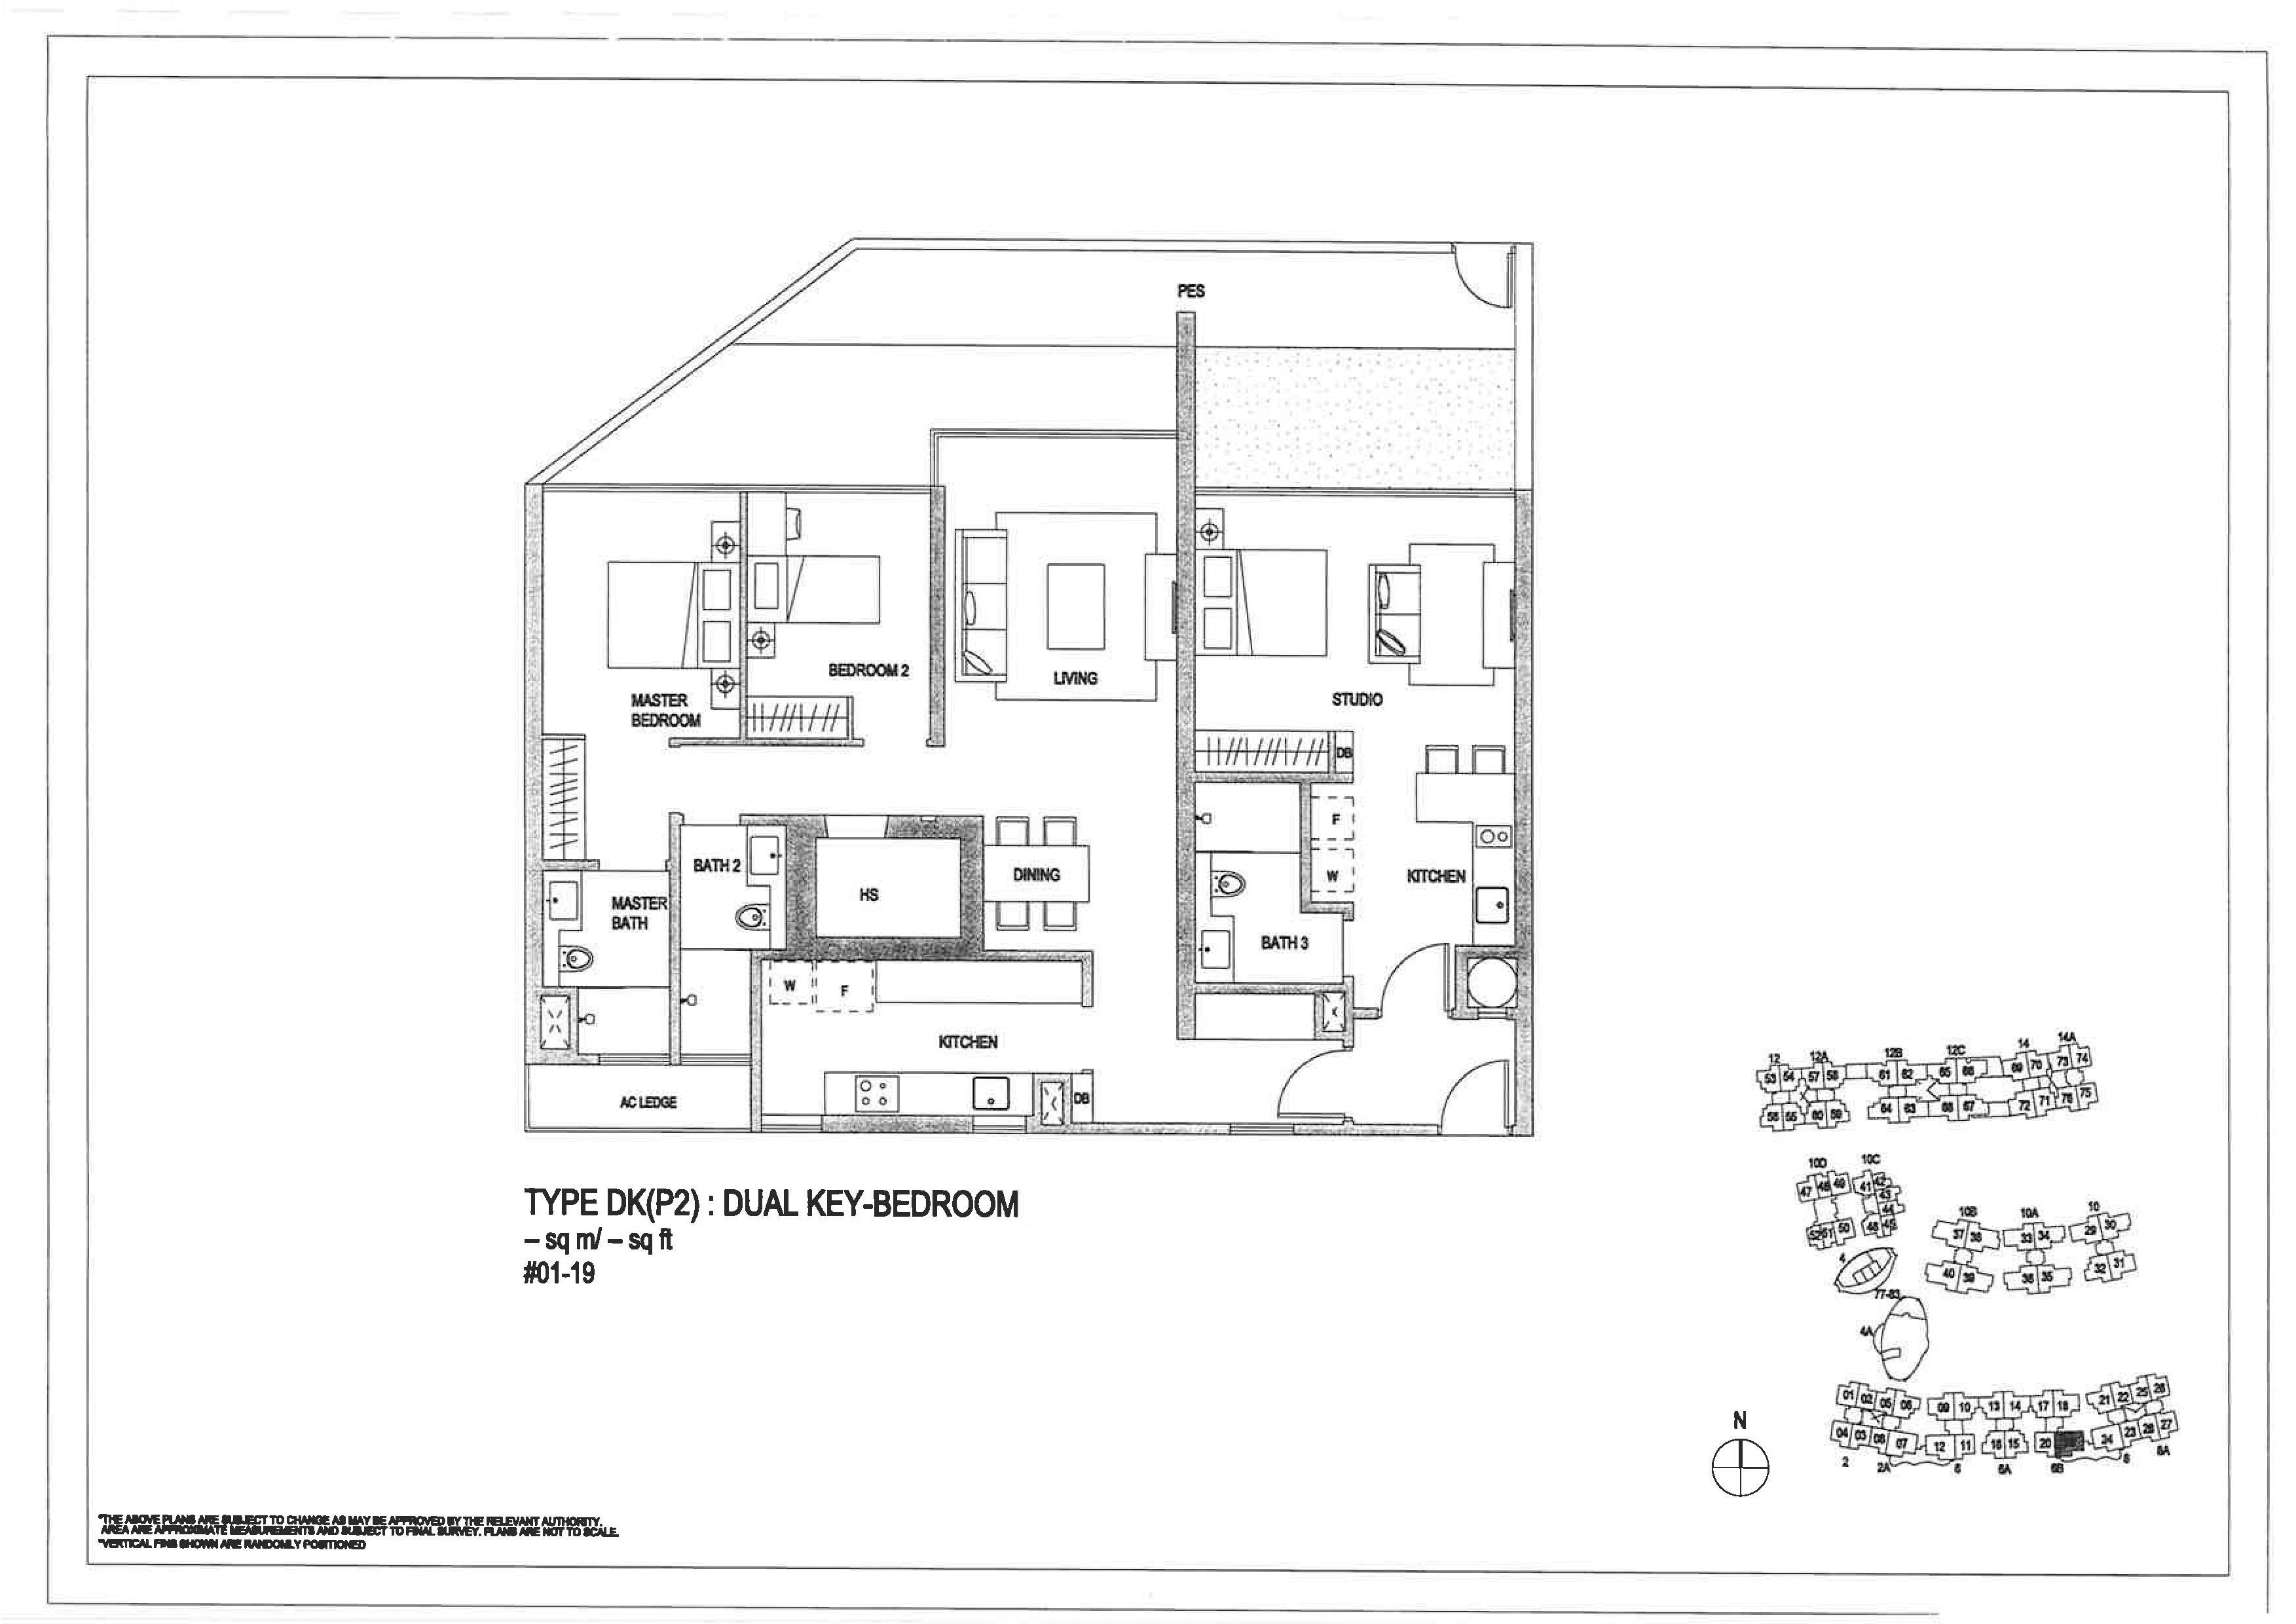 The Minton 3 Bedroom Dual Key Floor Plans Type DK(P2)